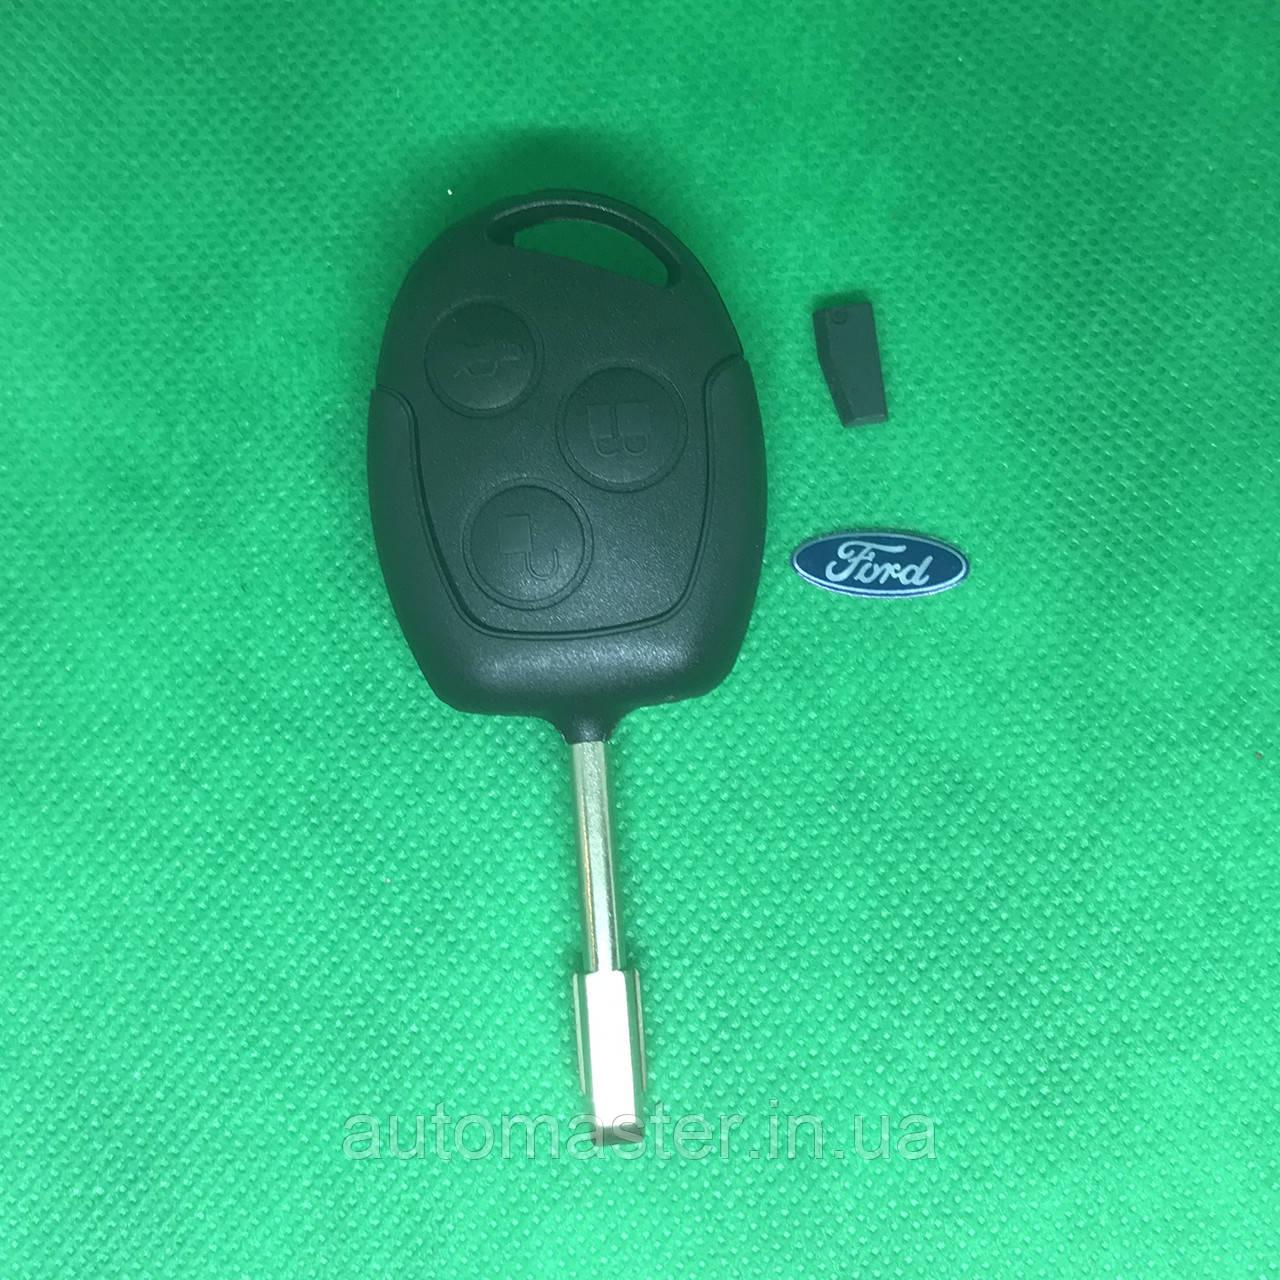 Ключ Ford (Форд) mondeo, focus, transit 3 кнопки с чипом 4D60 433Mhz лезвие FO21